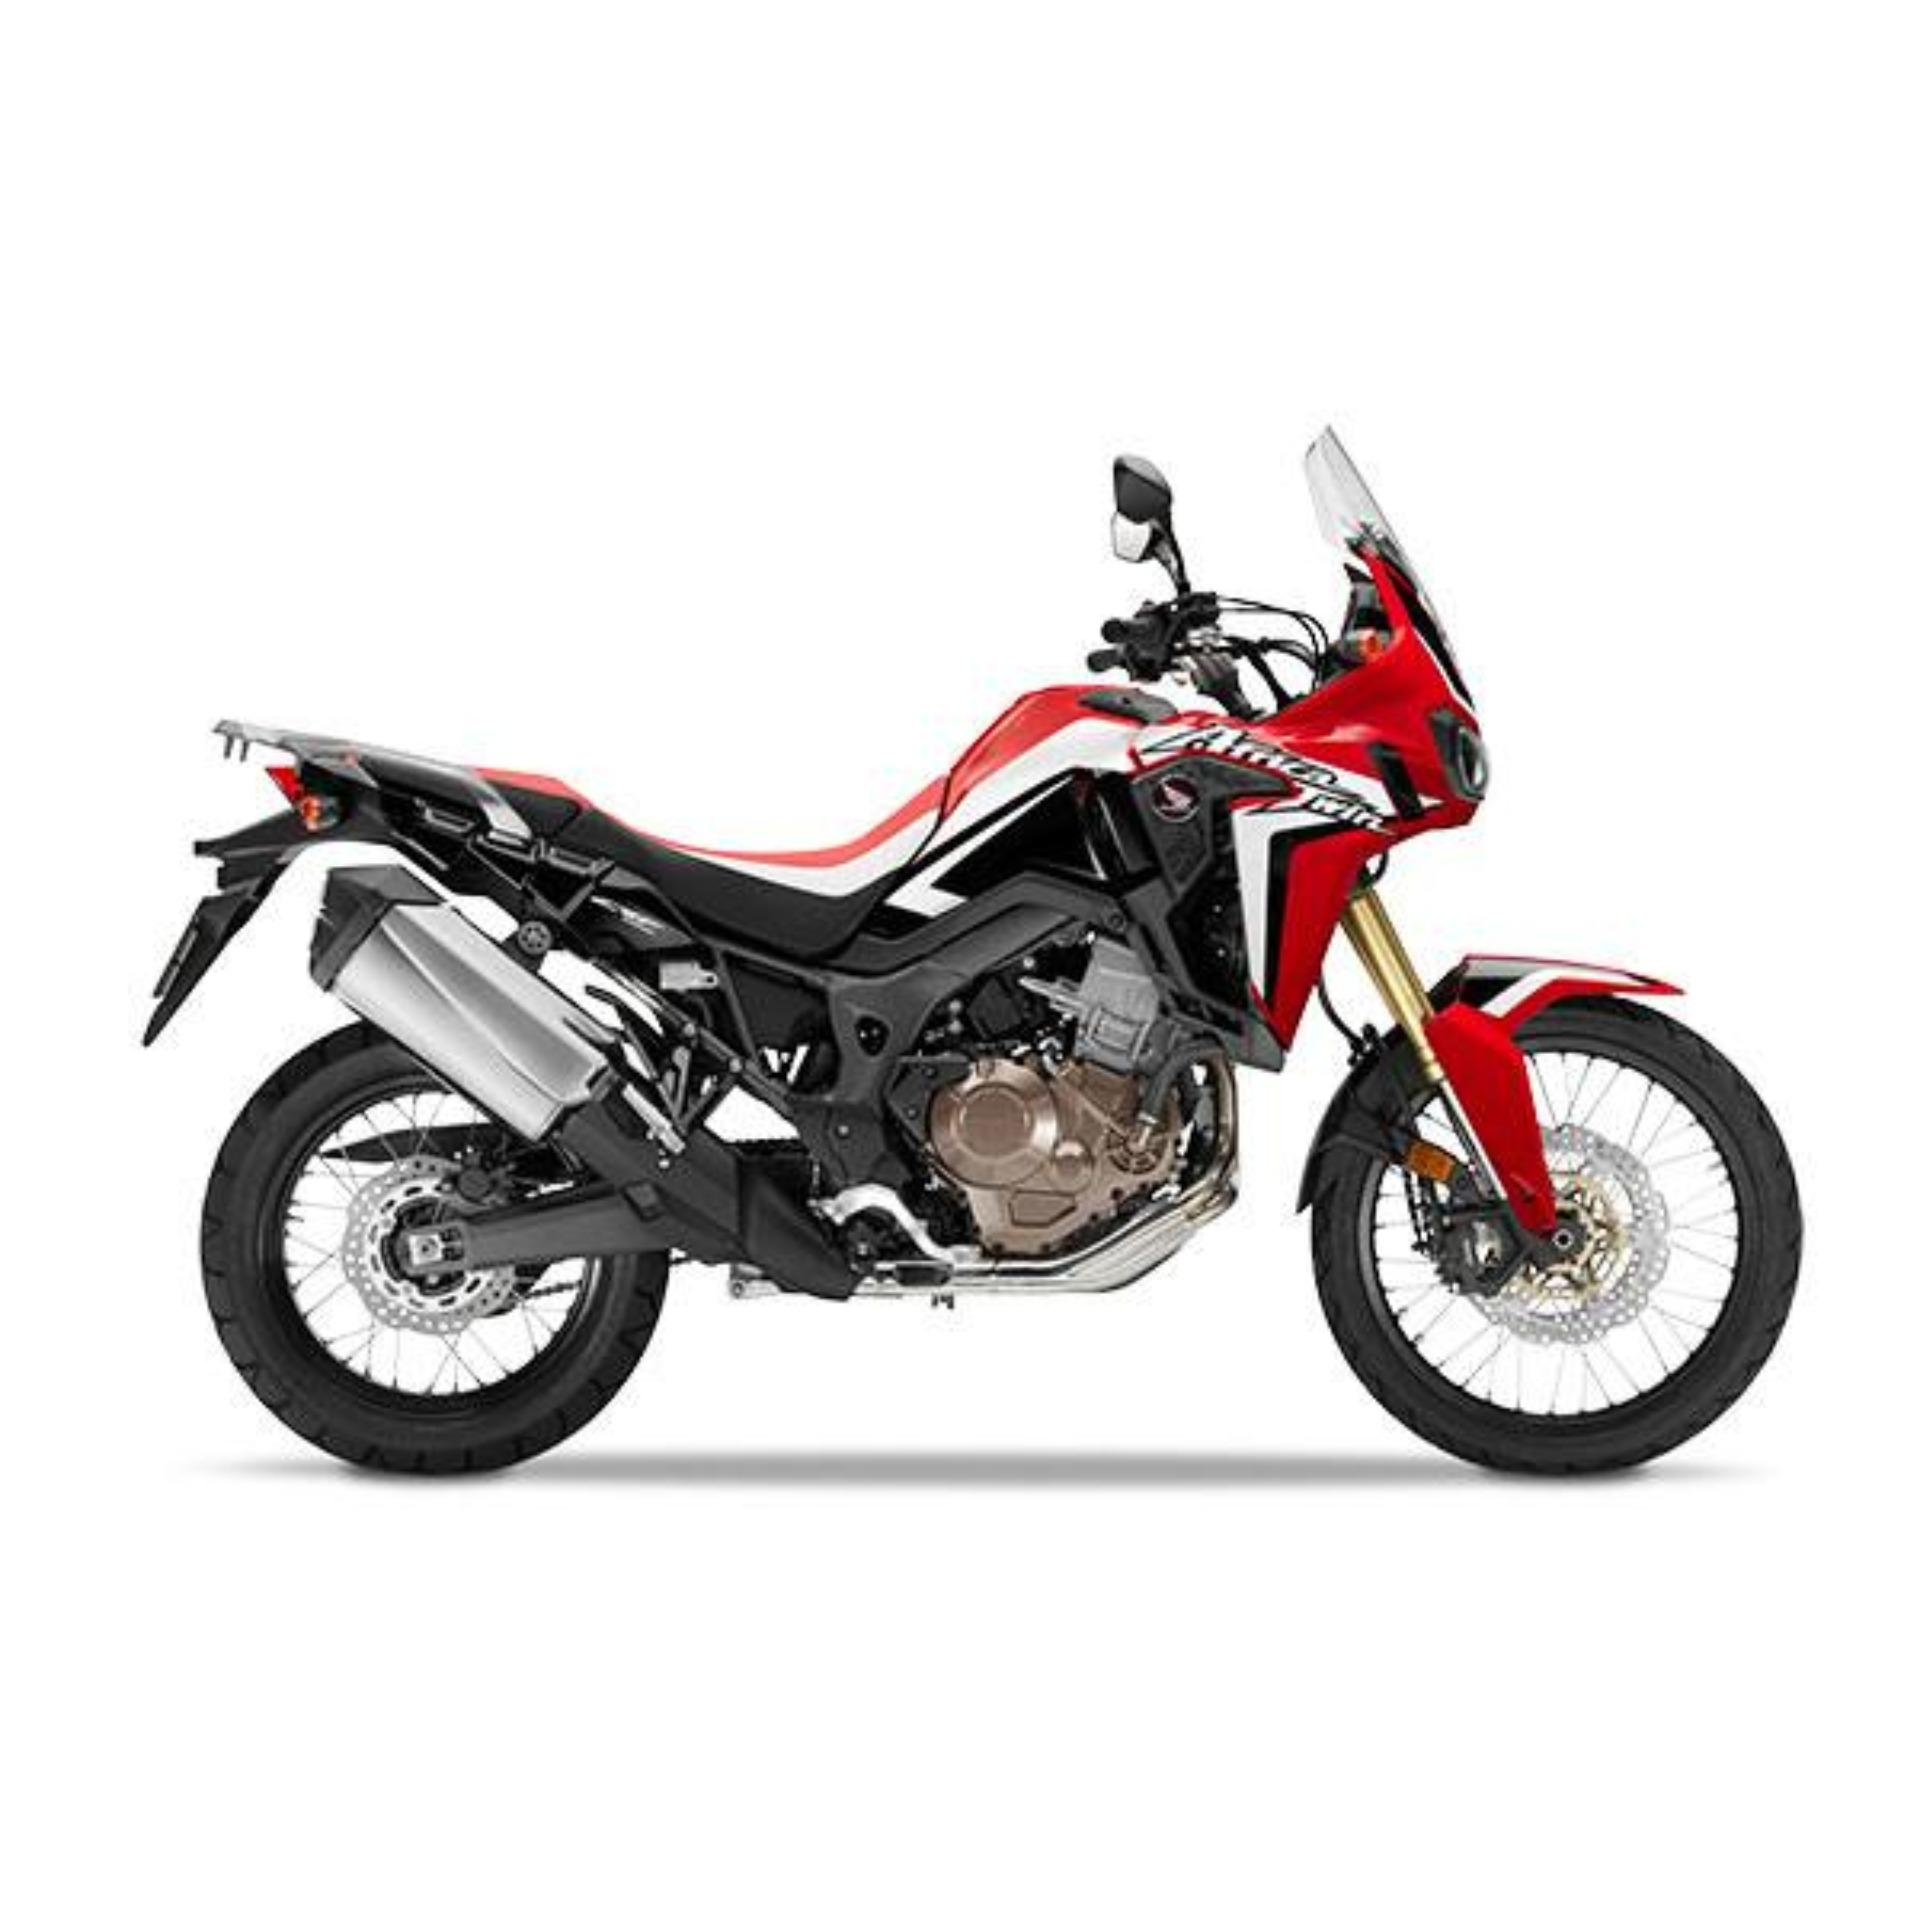 Harga Saya Honda Crf1000l Africa Twin M T Tipe Manual Sepeda Motor Vespa Lx 125 I Get Rosso Dragon Tangerang Red White